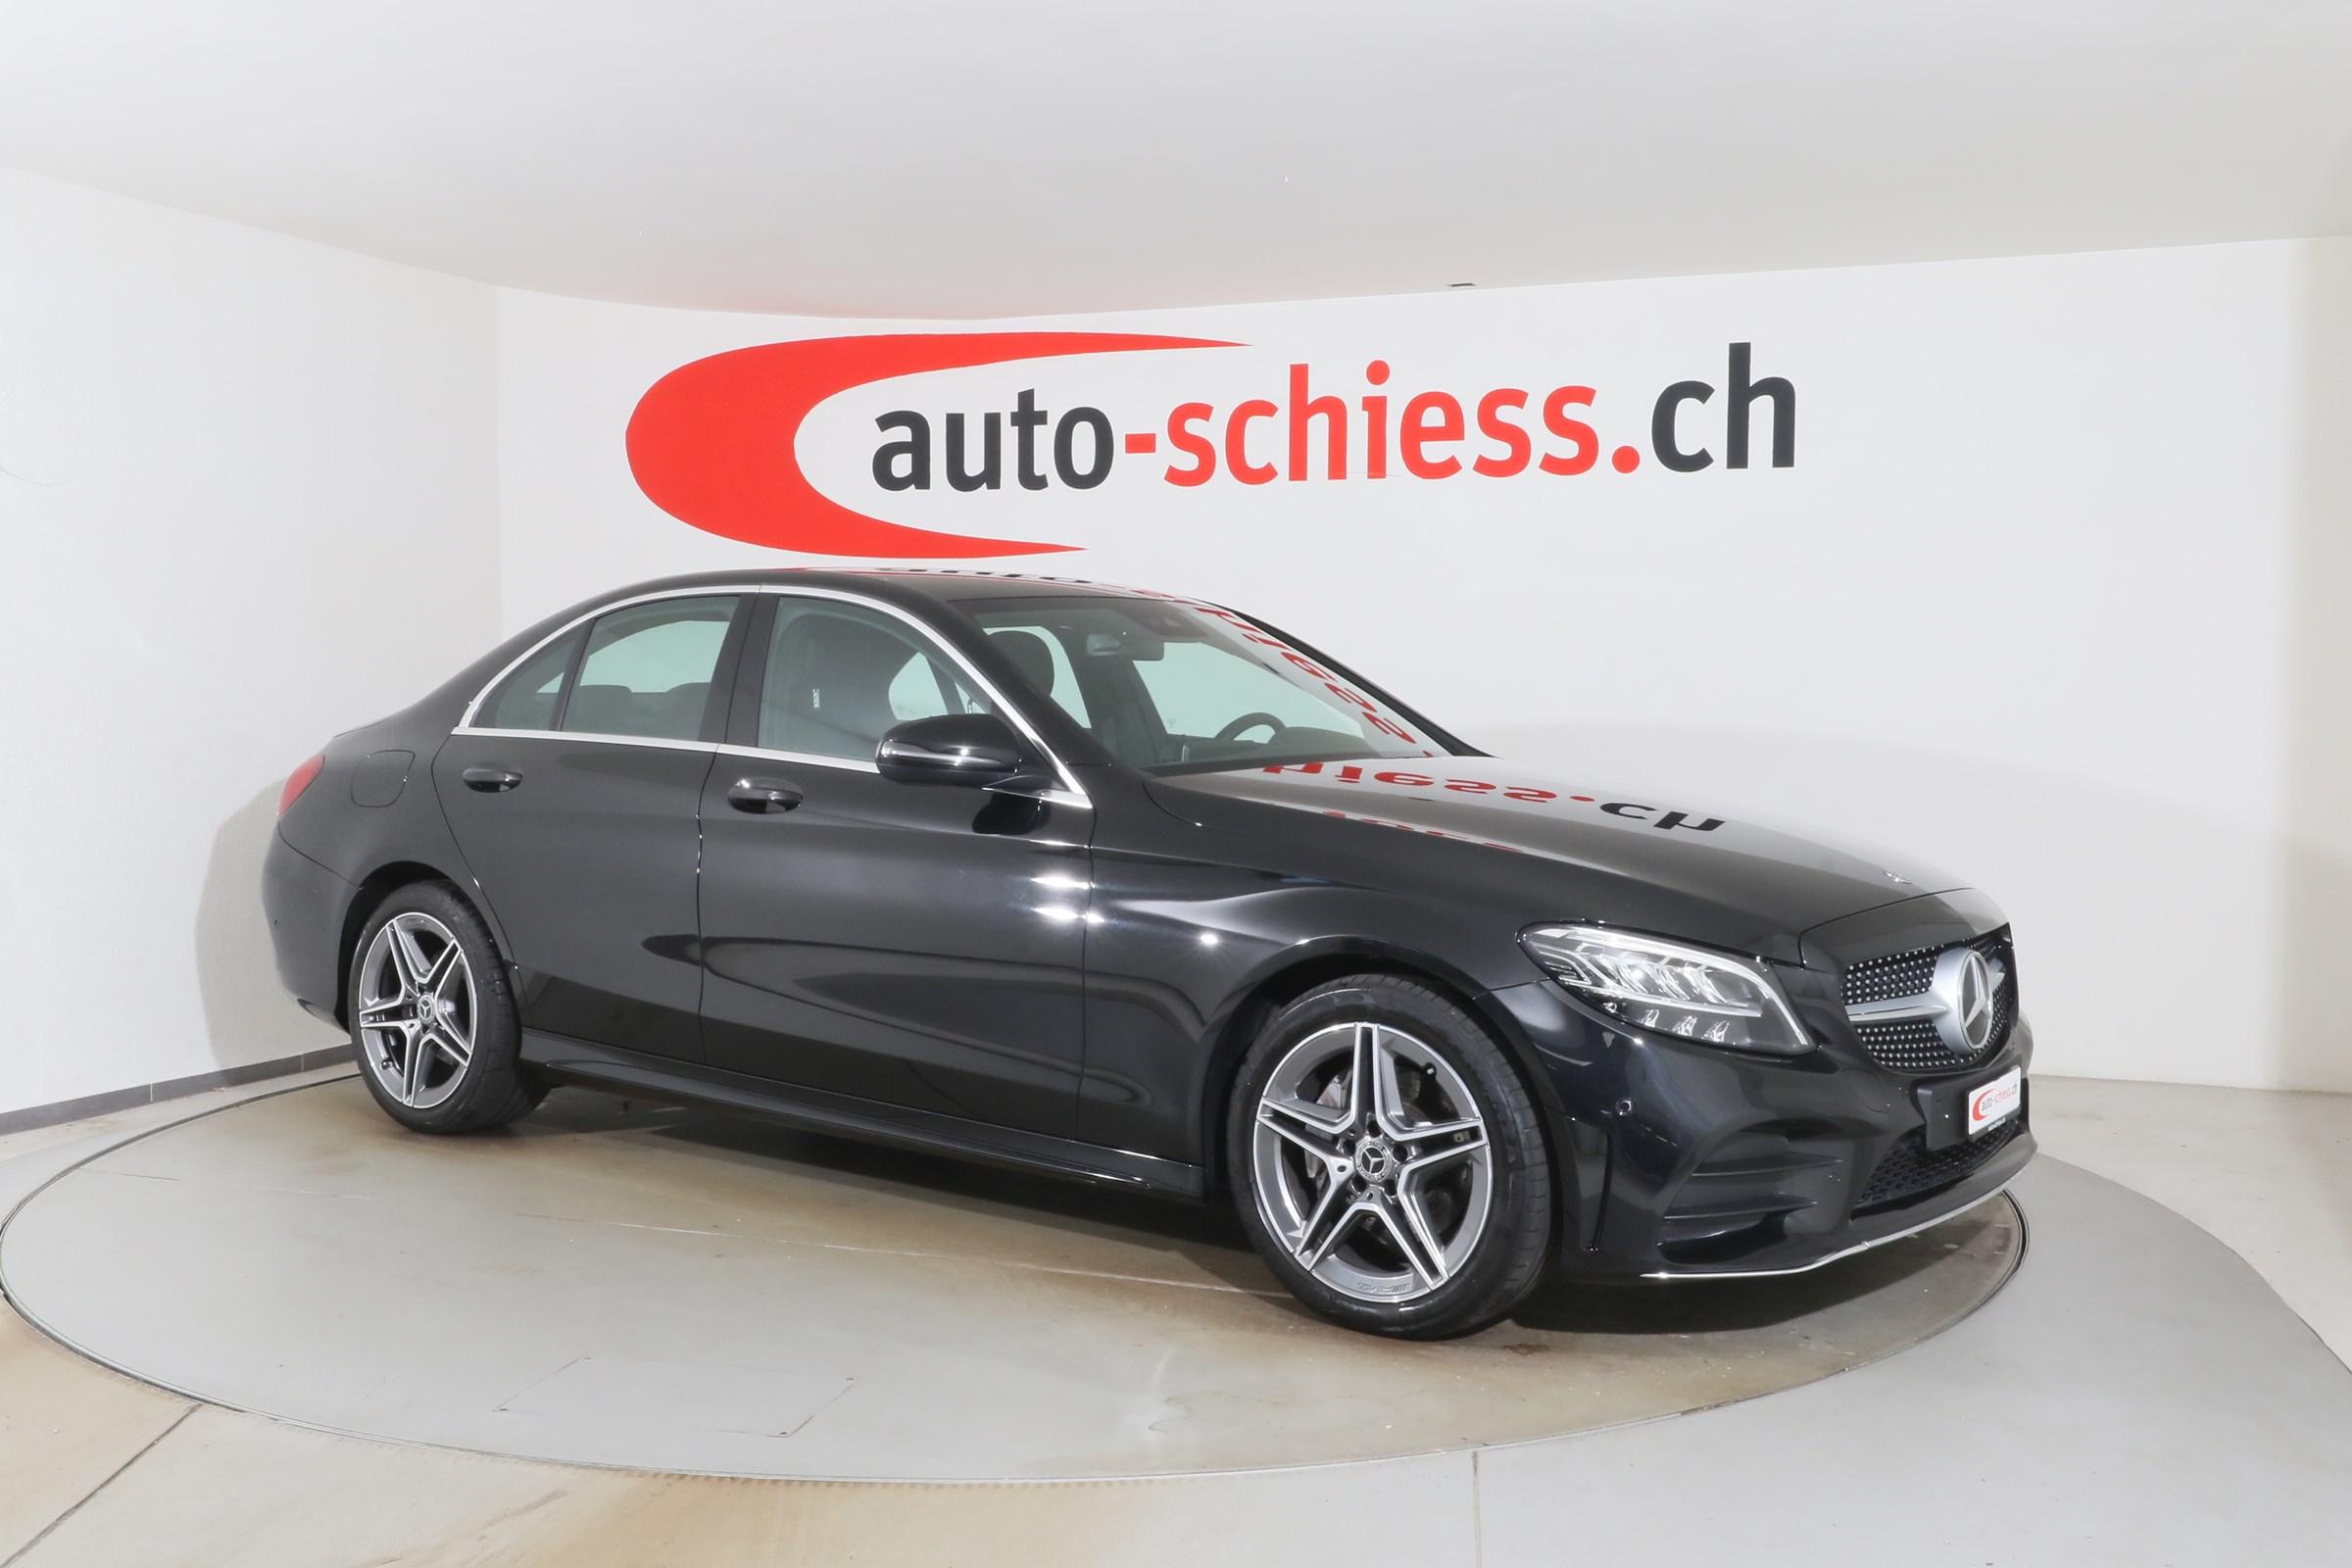 Buy Used Car Sedan Mercedes Benz C Klasse C 180 D Amg Line 9g Tronic 24867 Km At 28500 Chf On Carforyou Ch